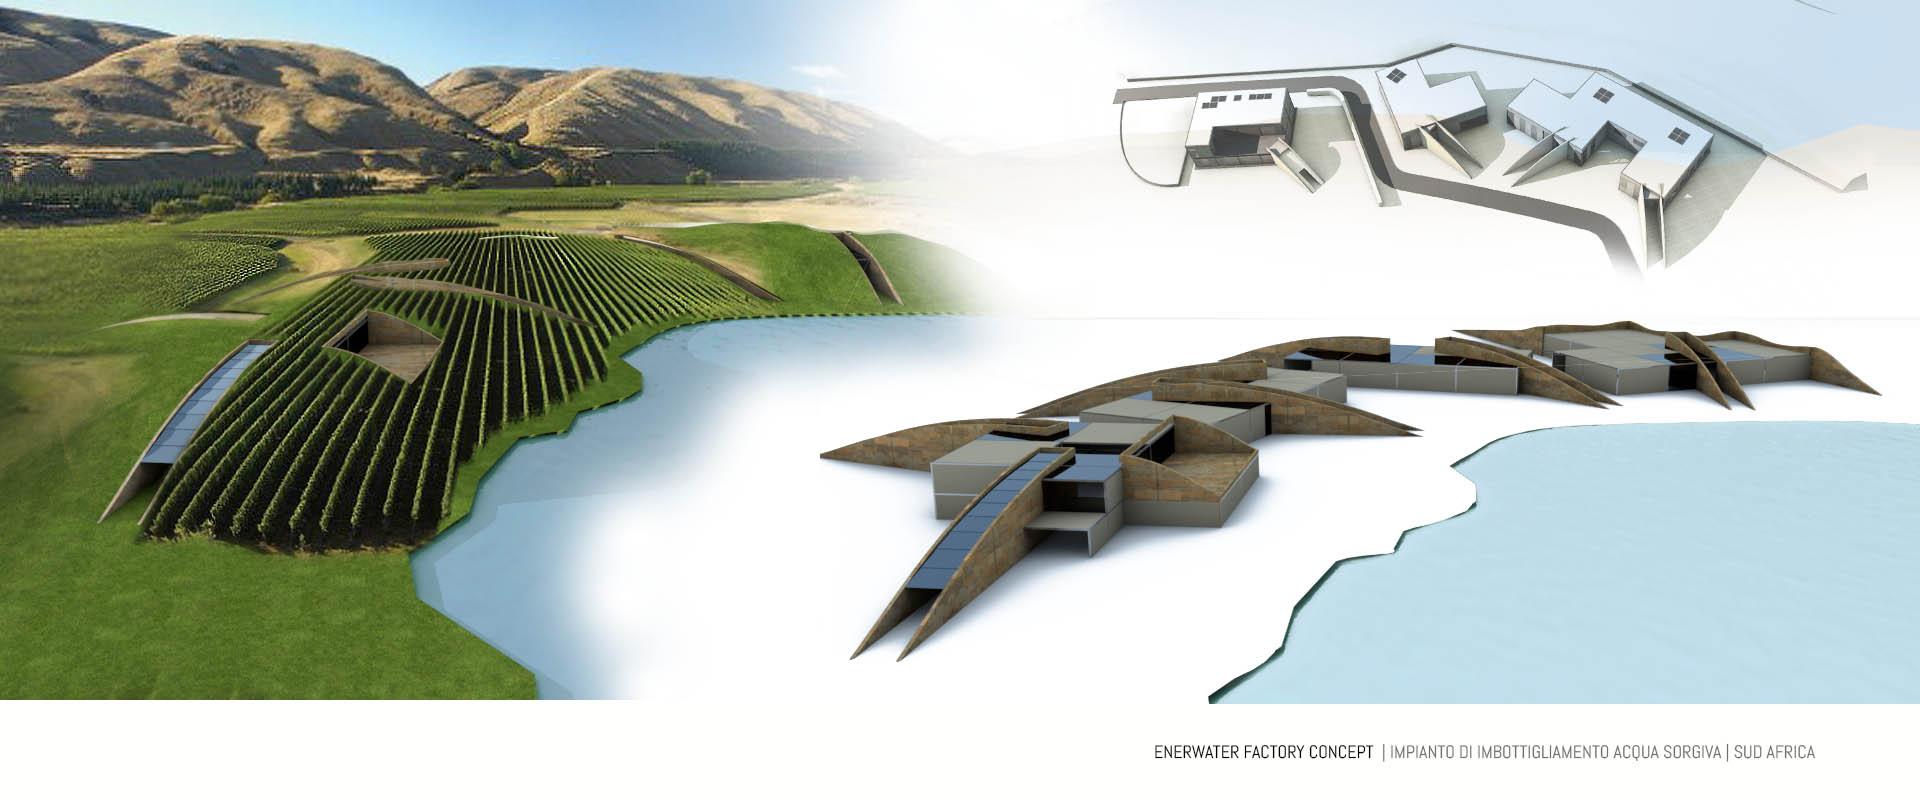 aironic_ugo_capparelli_architettura__rendering__ewater